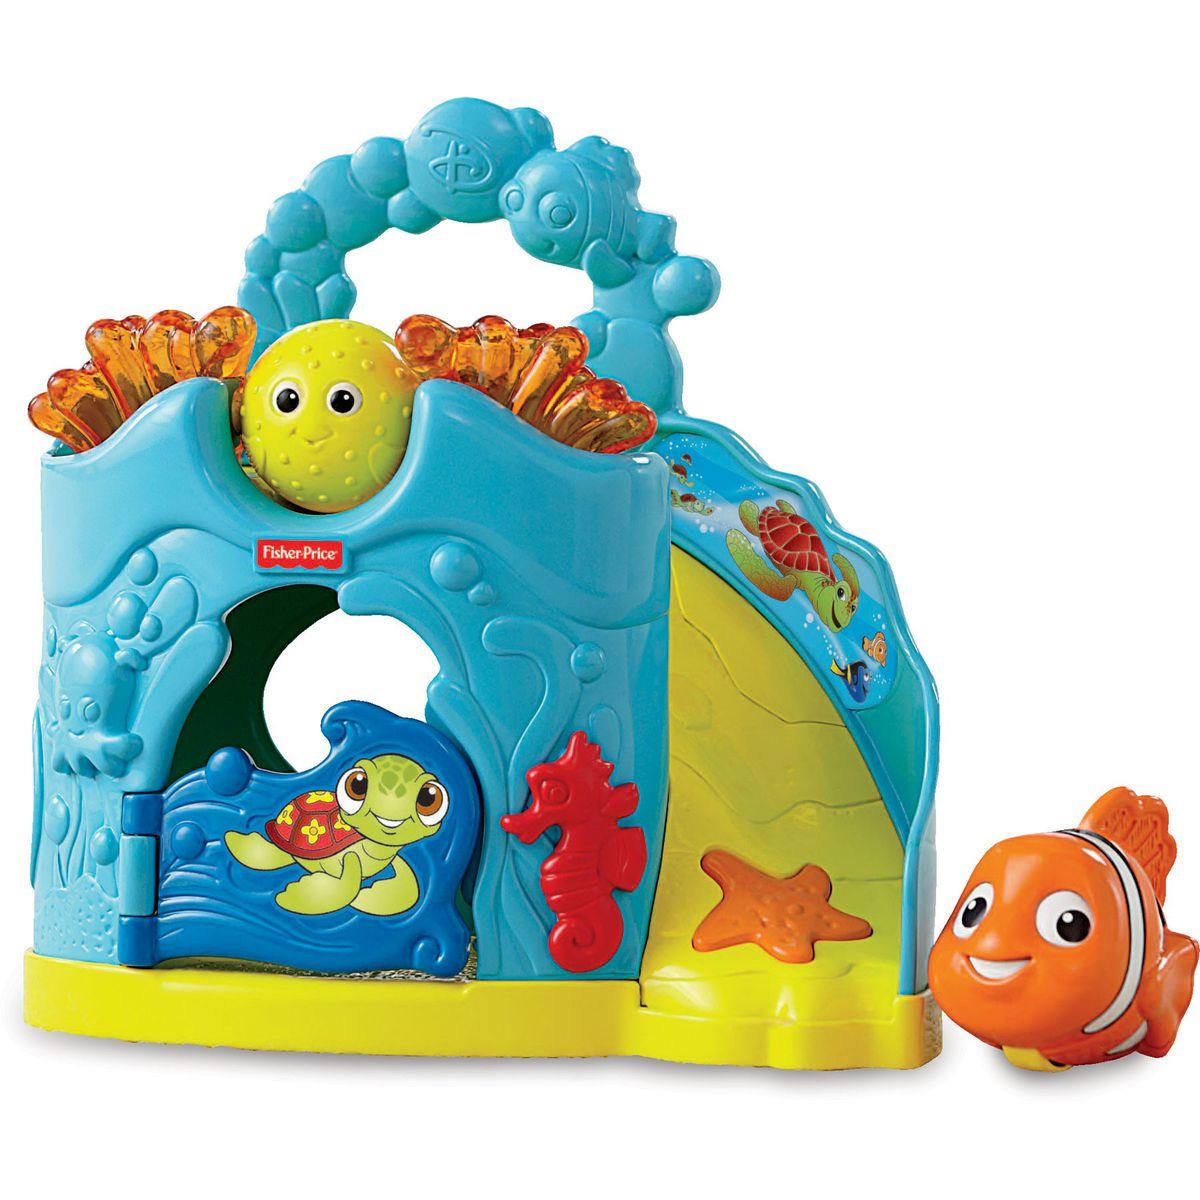 Fisher-price - Disney - Nemo Rolling Round Ramp | Buy Online in ...